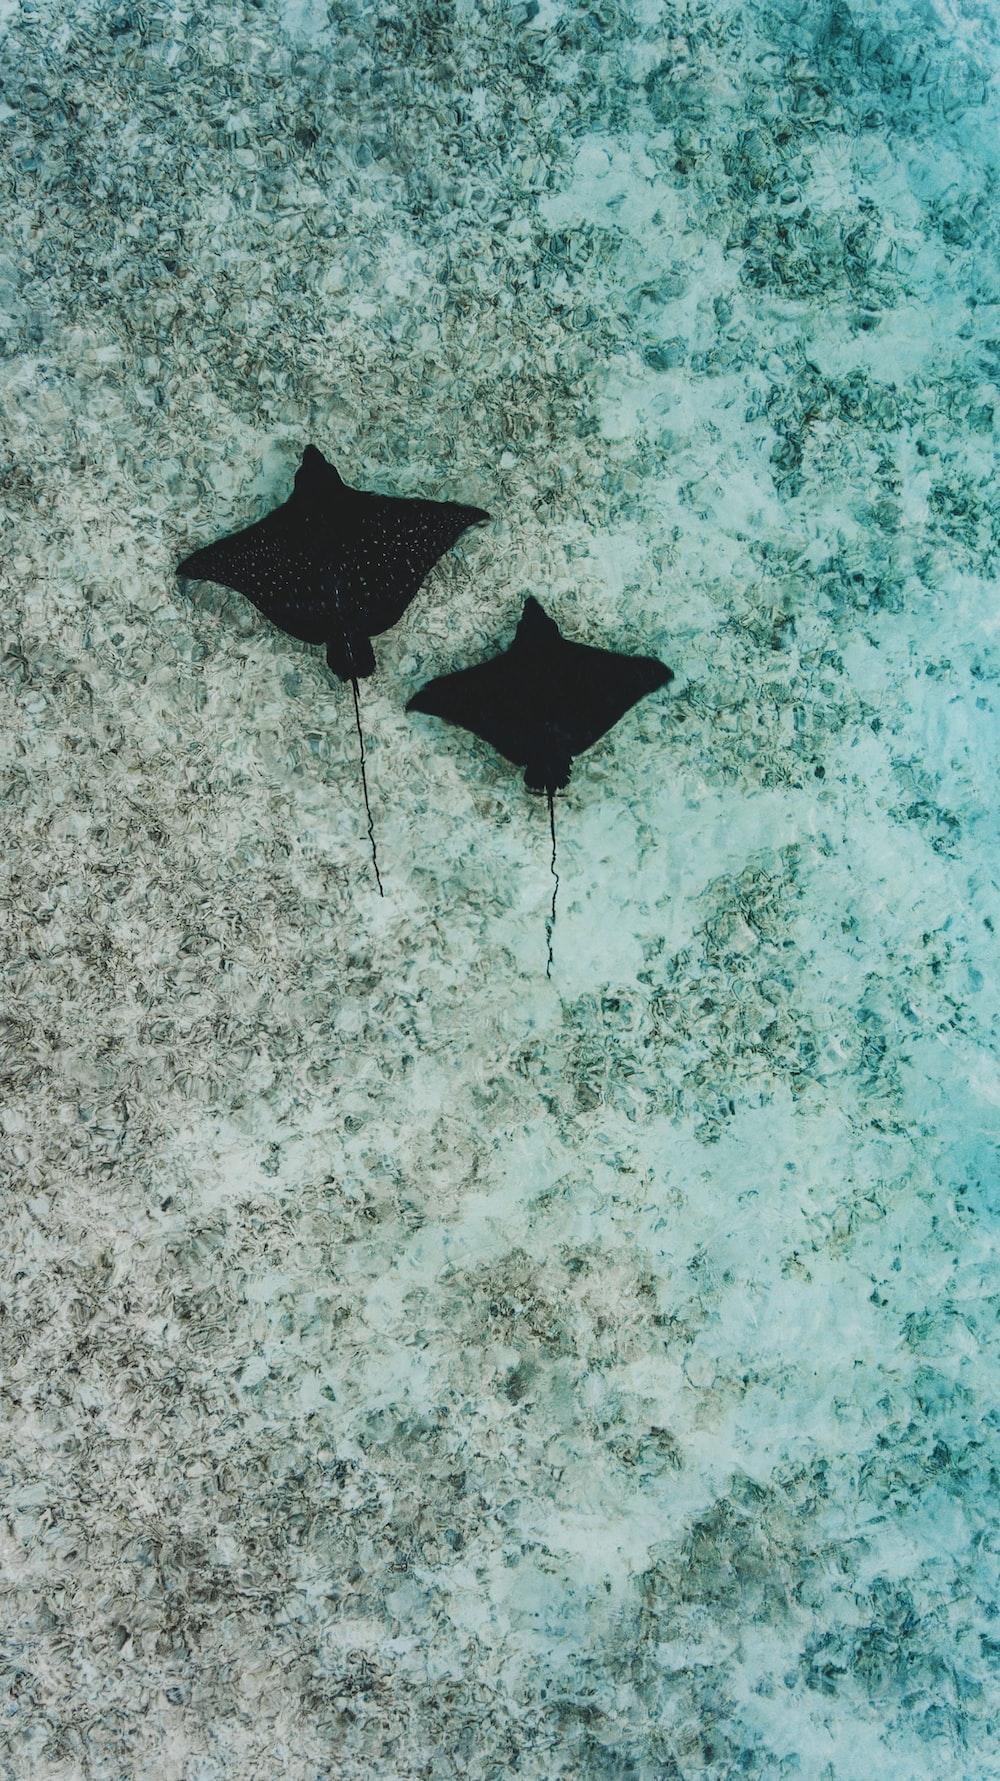 two black stingray